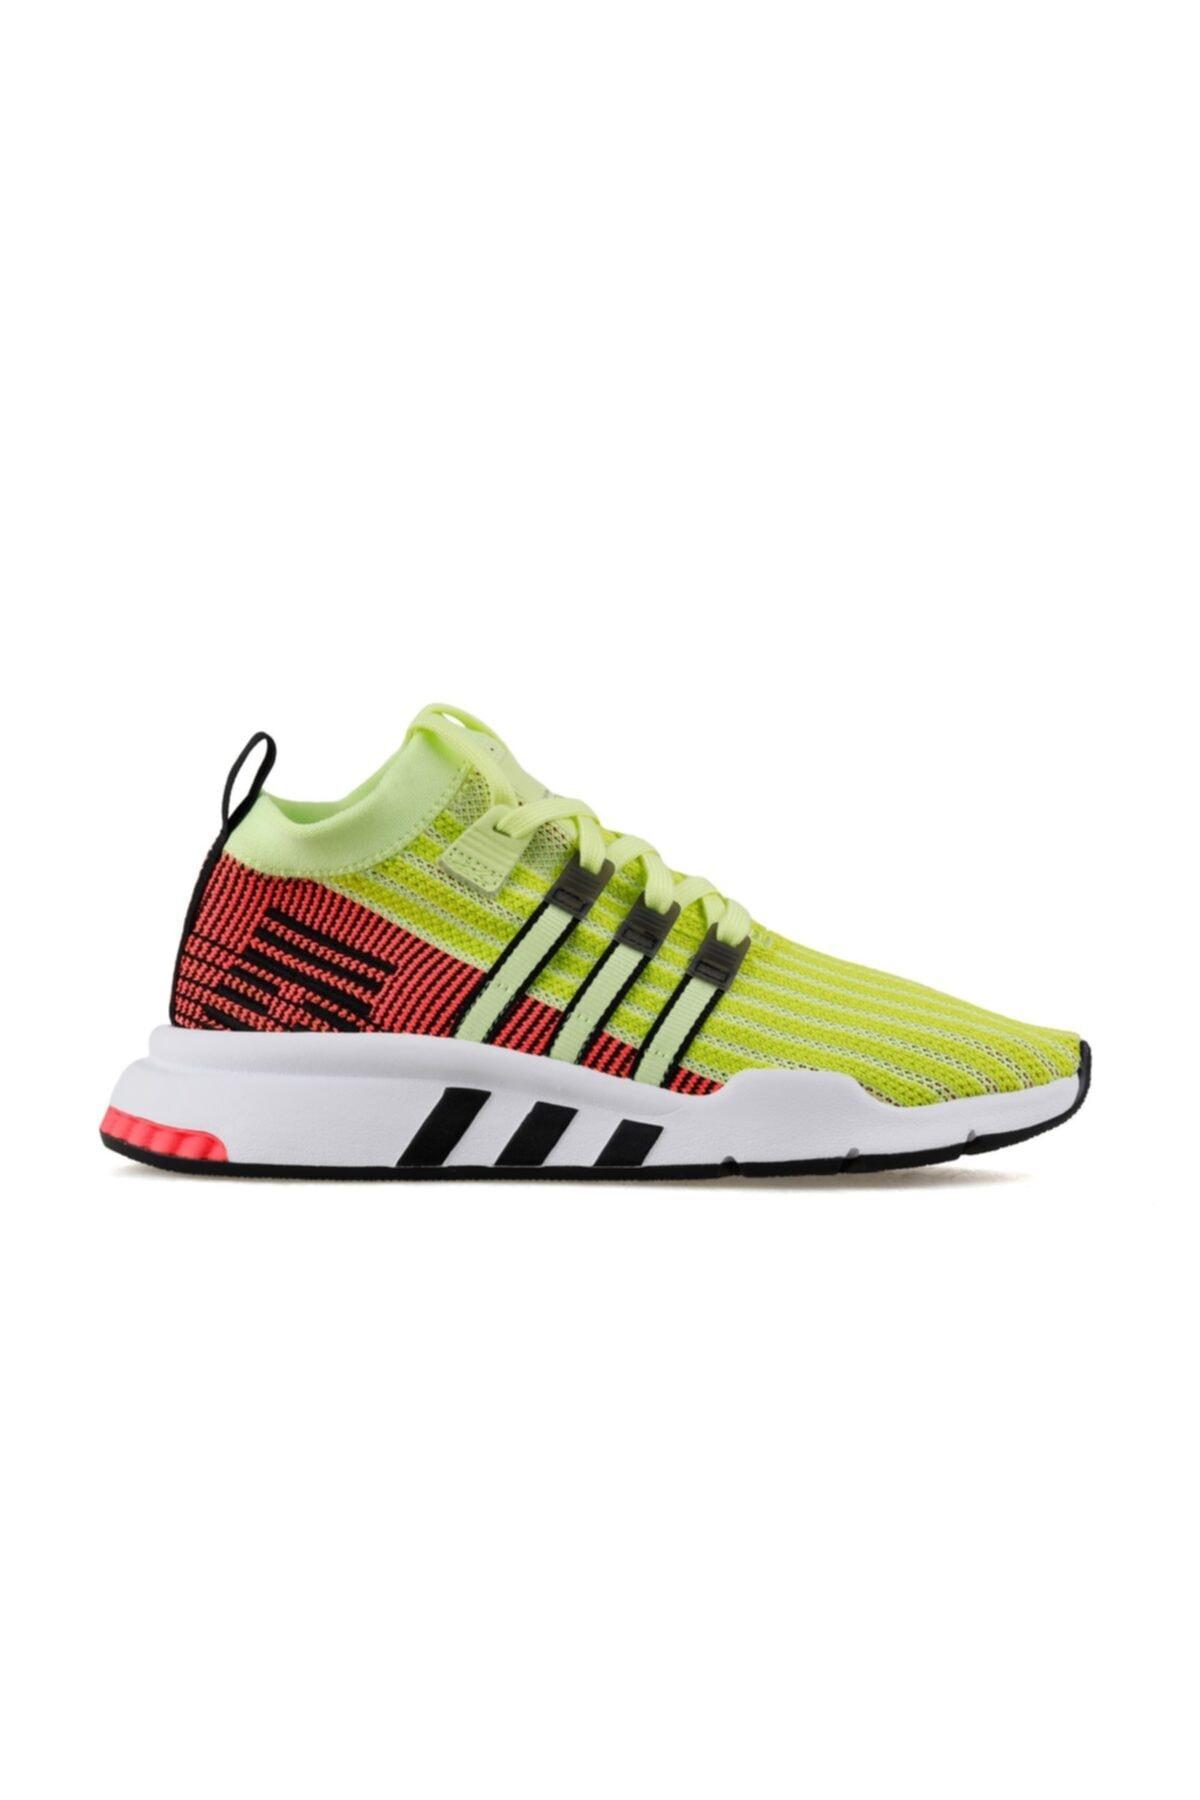 adidas Eqt Support Mid B37436 Erkek Spor Ayakkabı 1